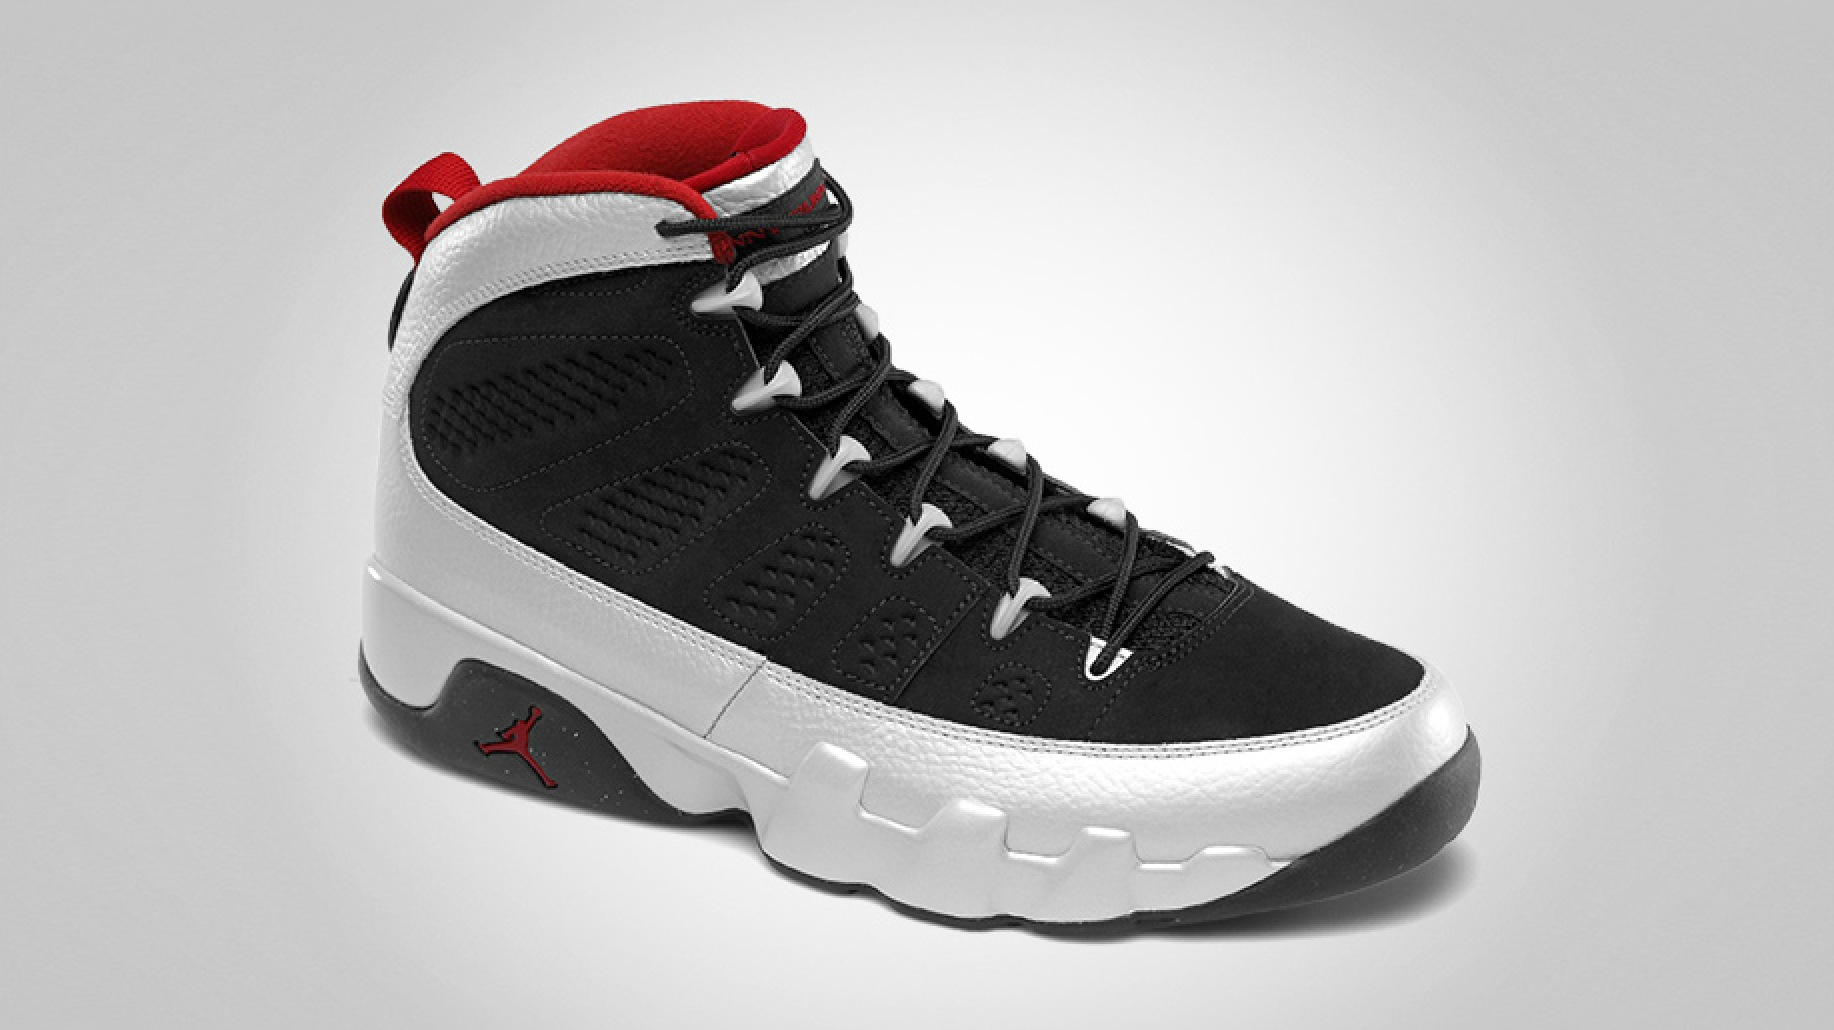 Air Jordan IX (9) 'Johnny Kilroy' - Official Images